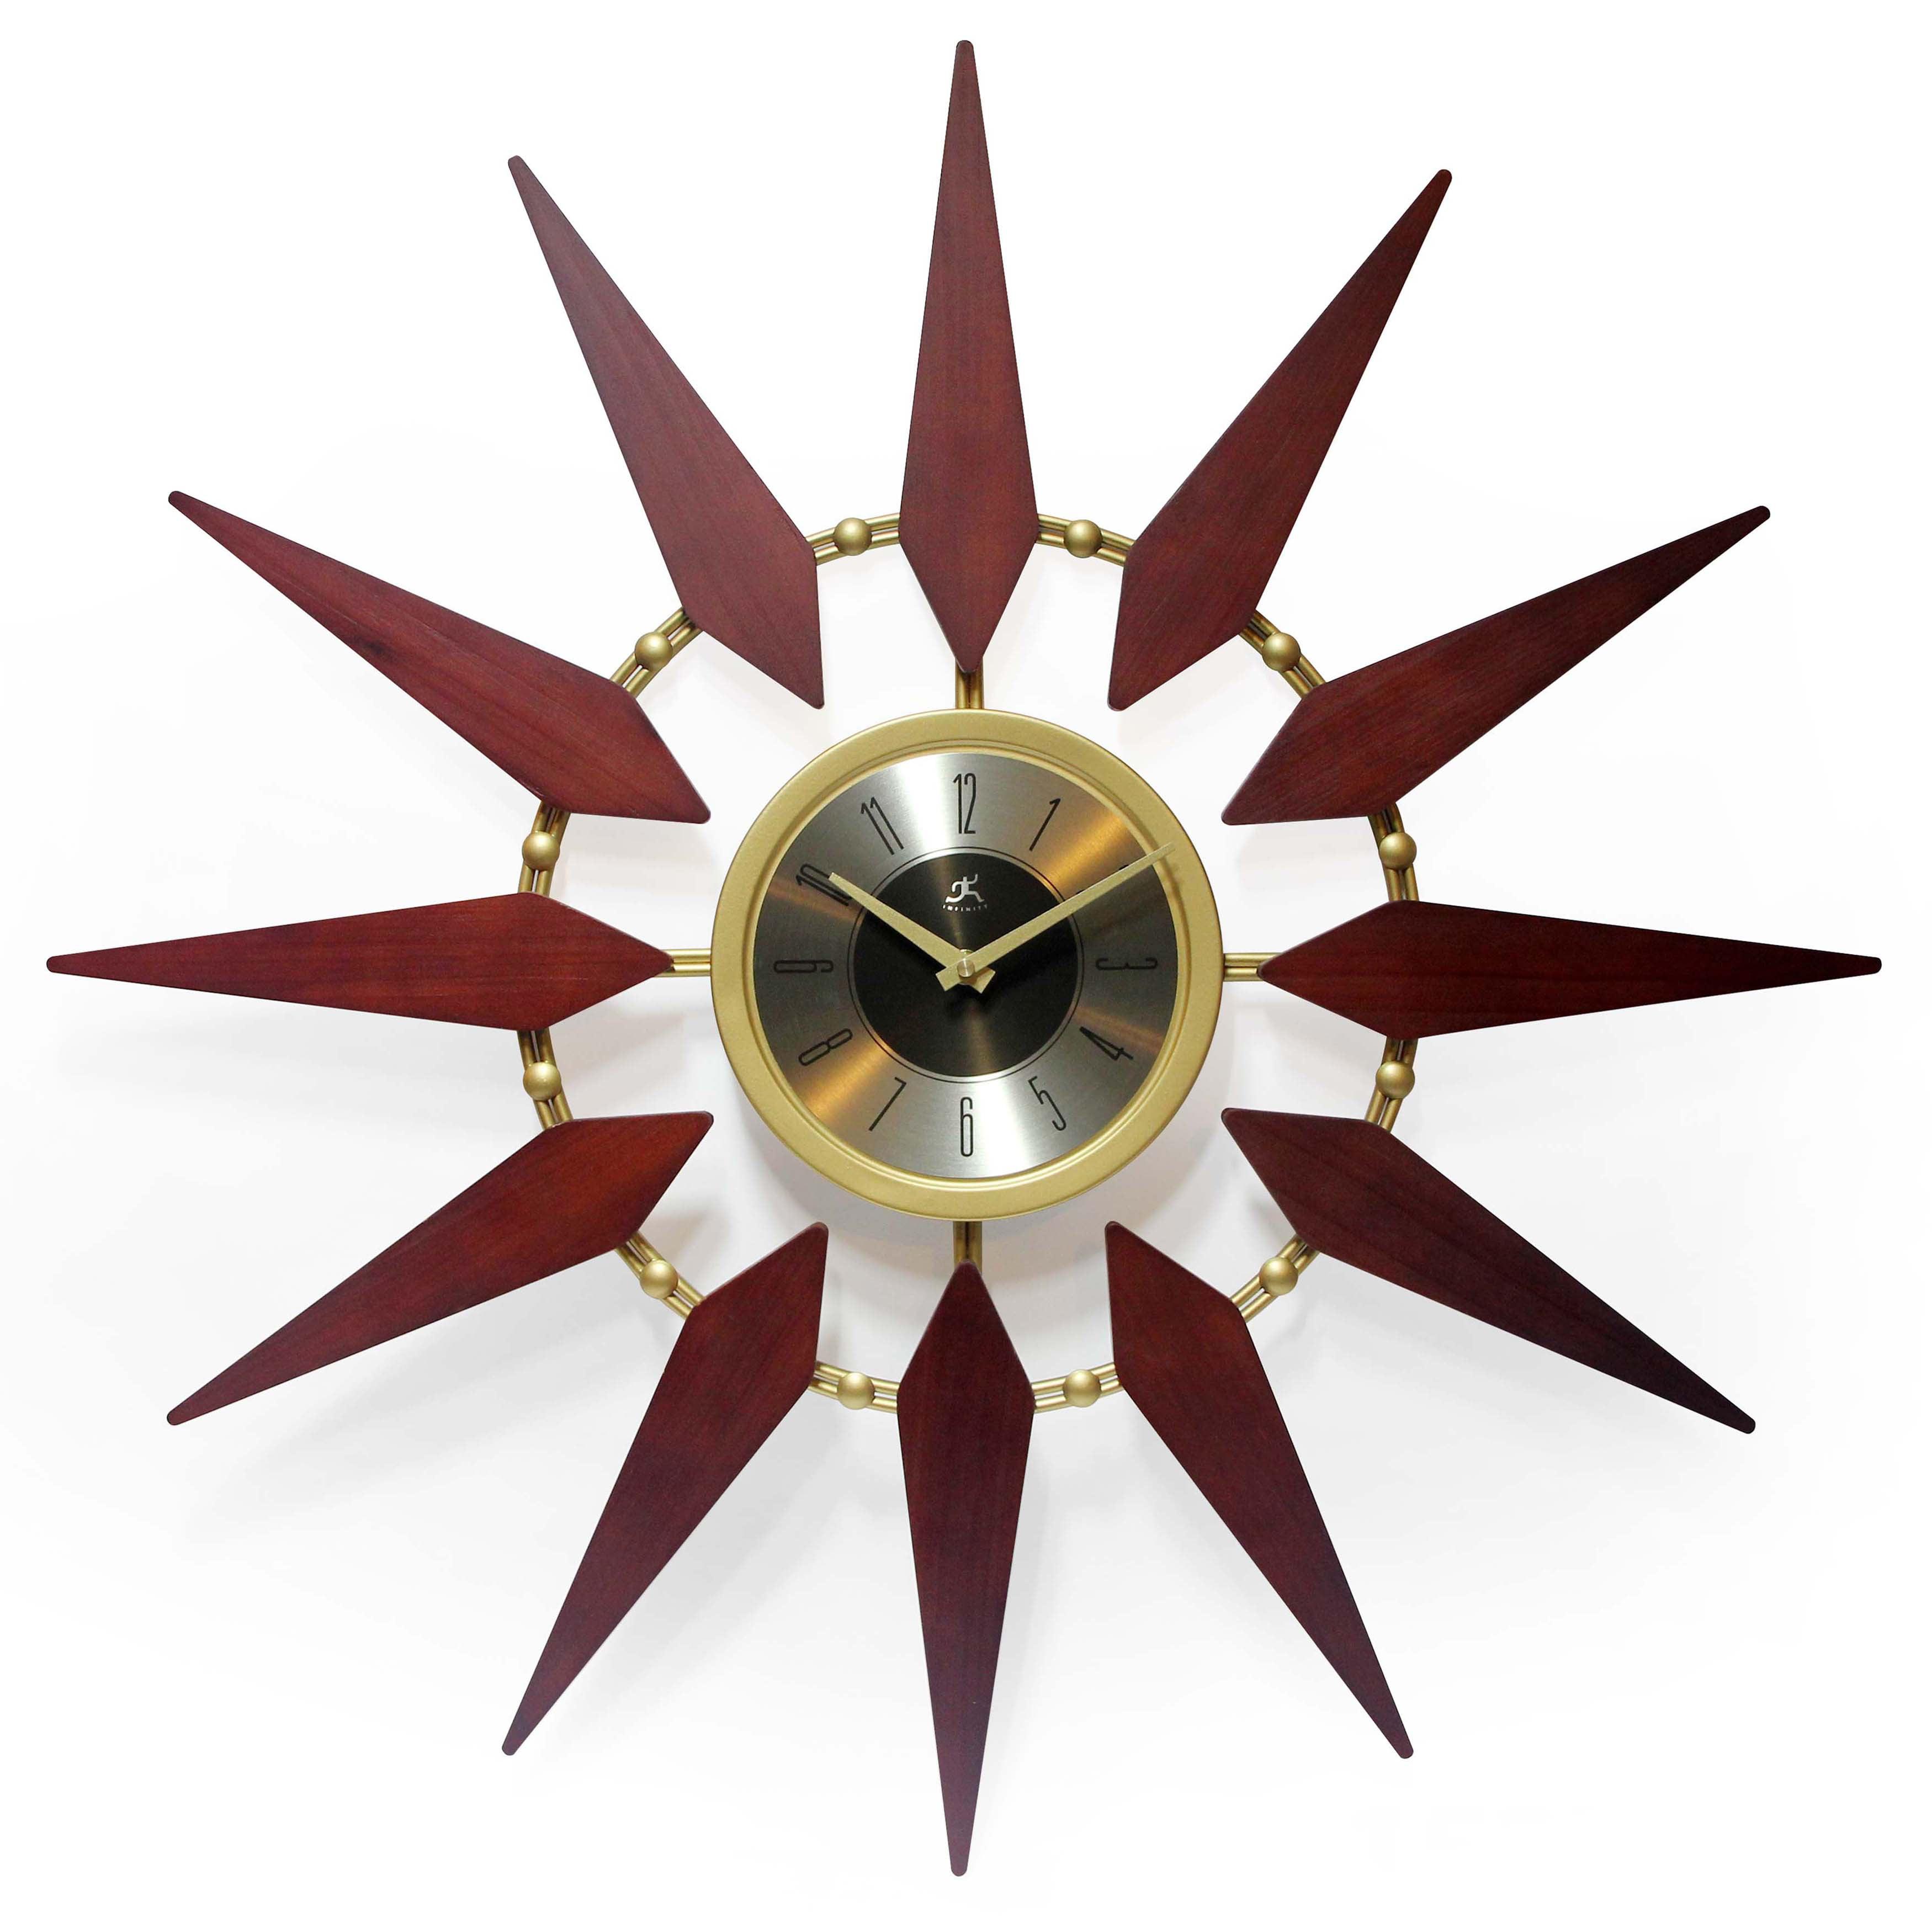 30 inch Mid-Century Gold Walnut Sunburst Wall Clock, Orion by Infinity Instruments